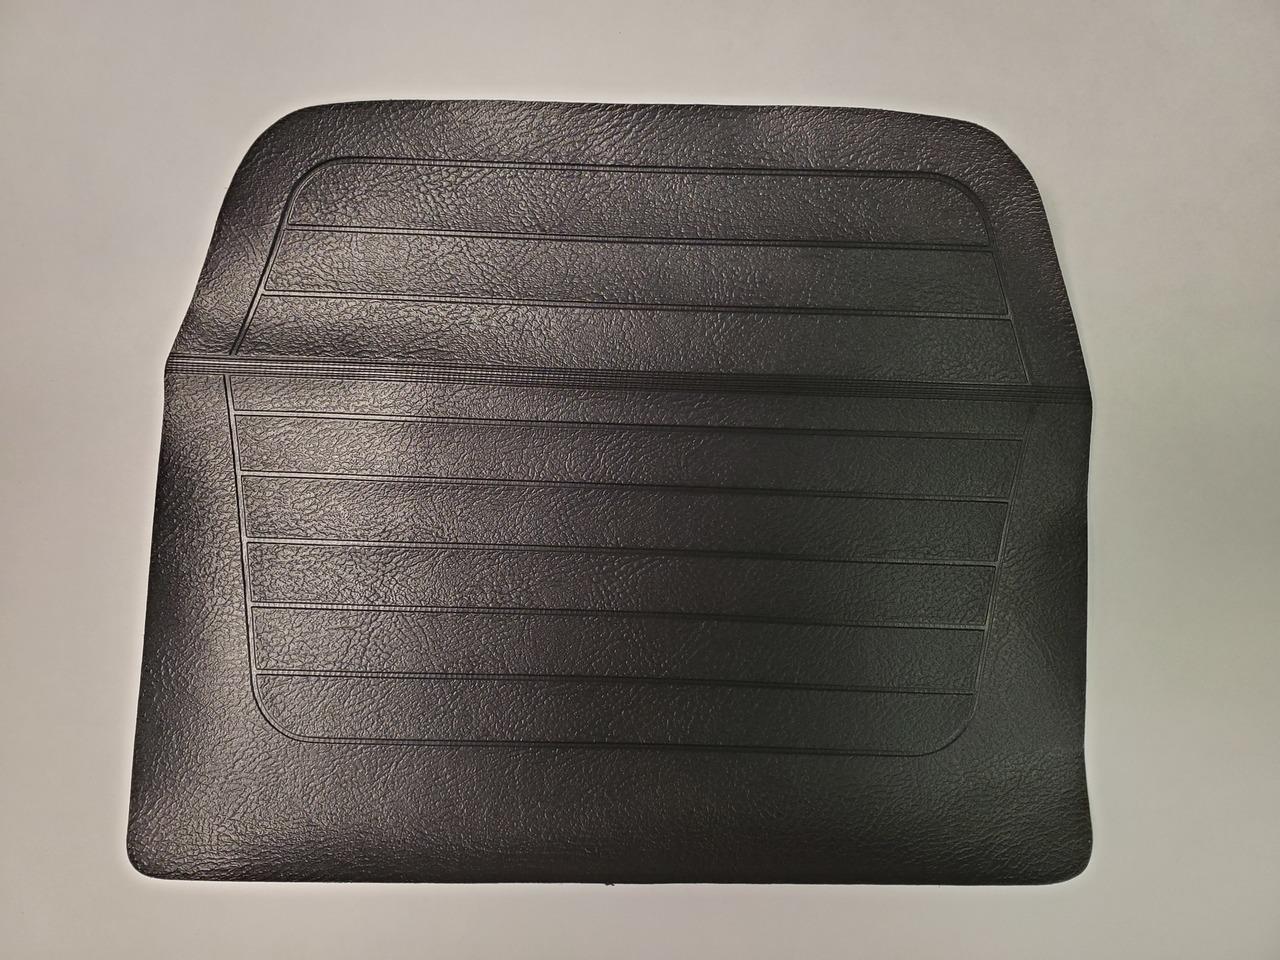 seat-vinyl-black-9007blk-61741.1568303983.jpg